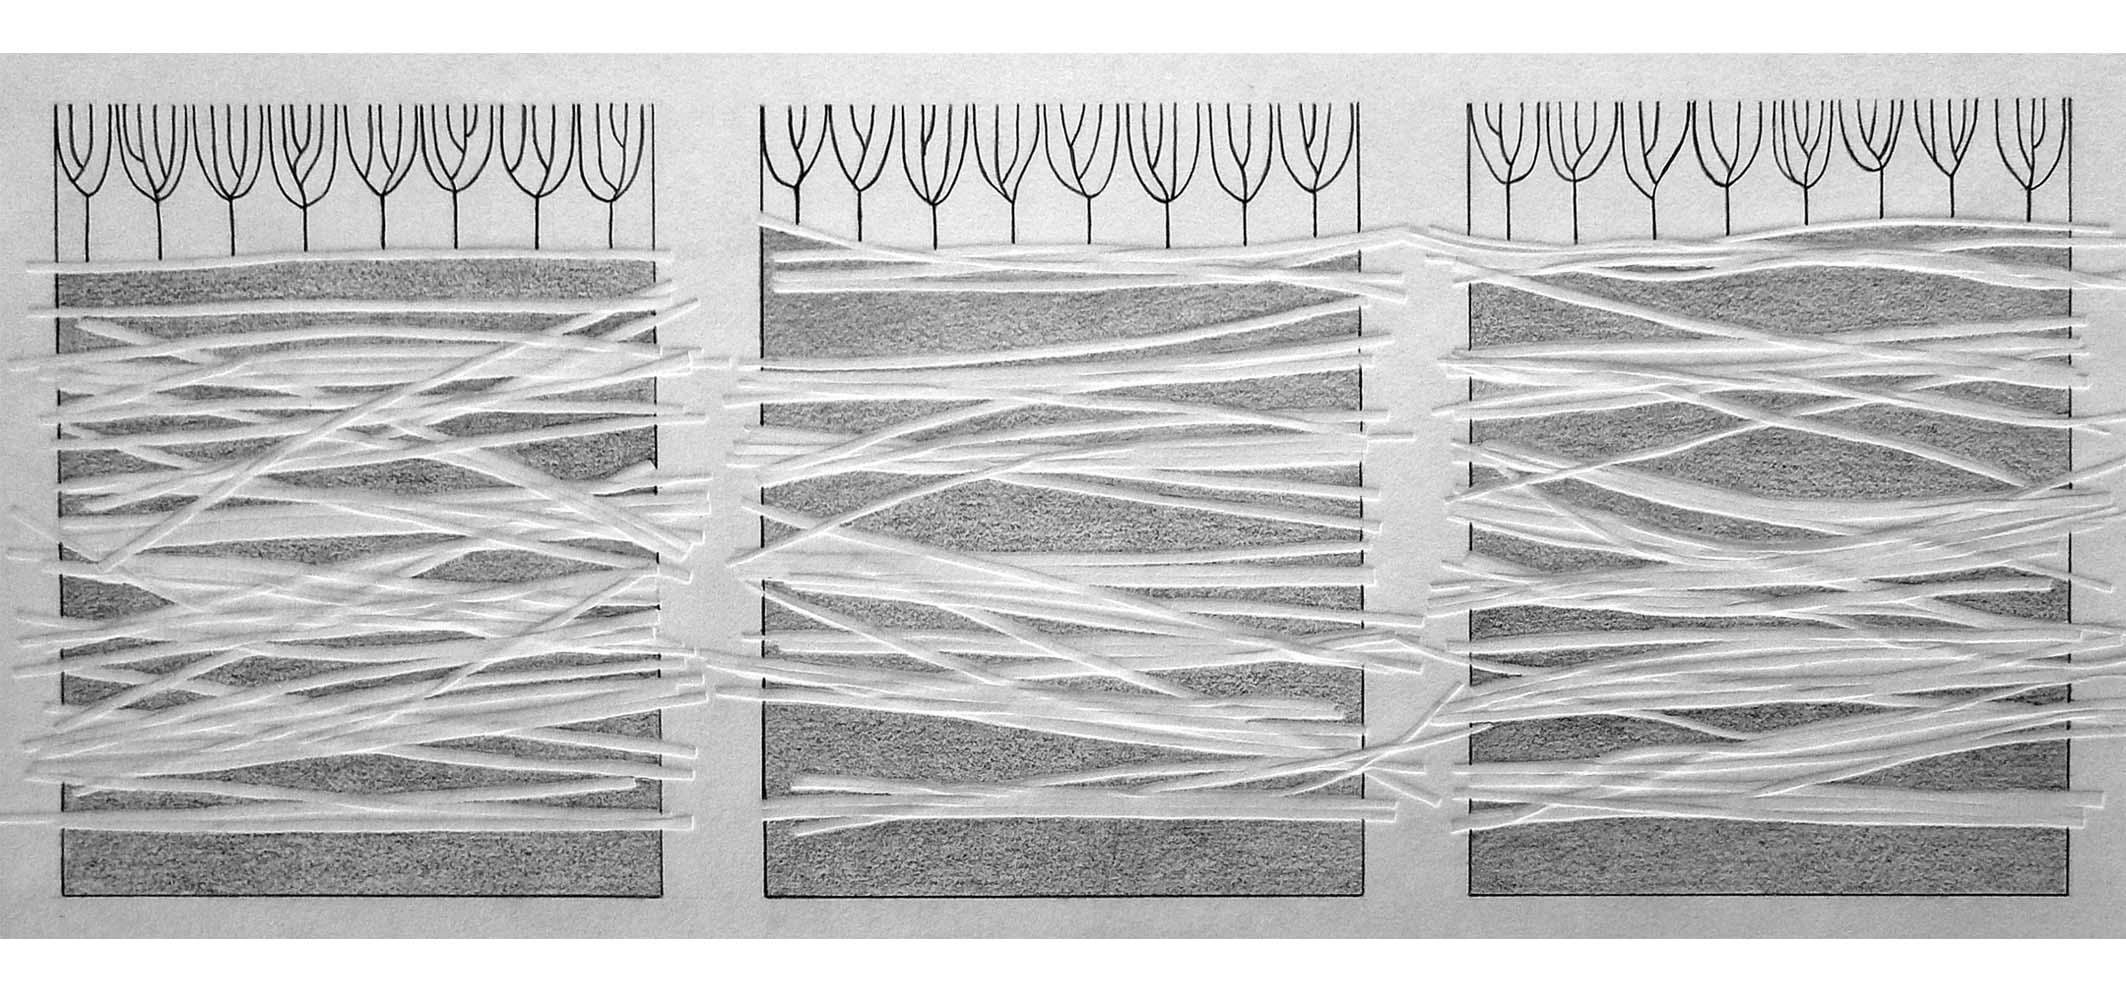 Vlasakker IV, 2014  (blinddruk, potlood) 25cm x 55cm